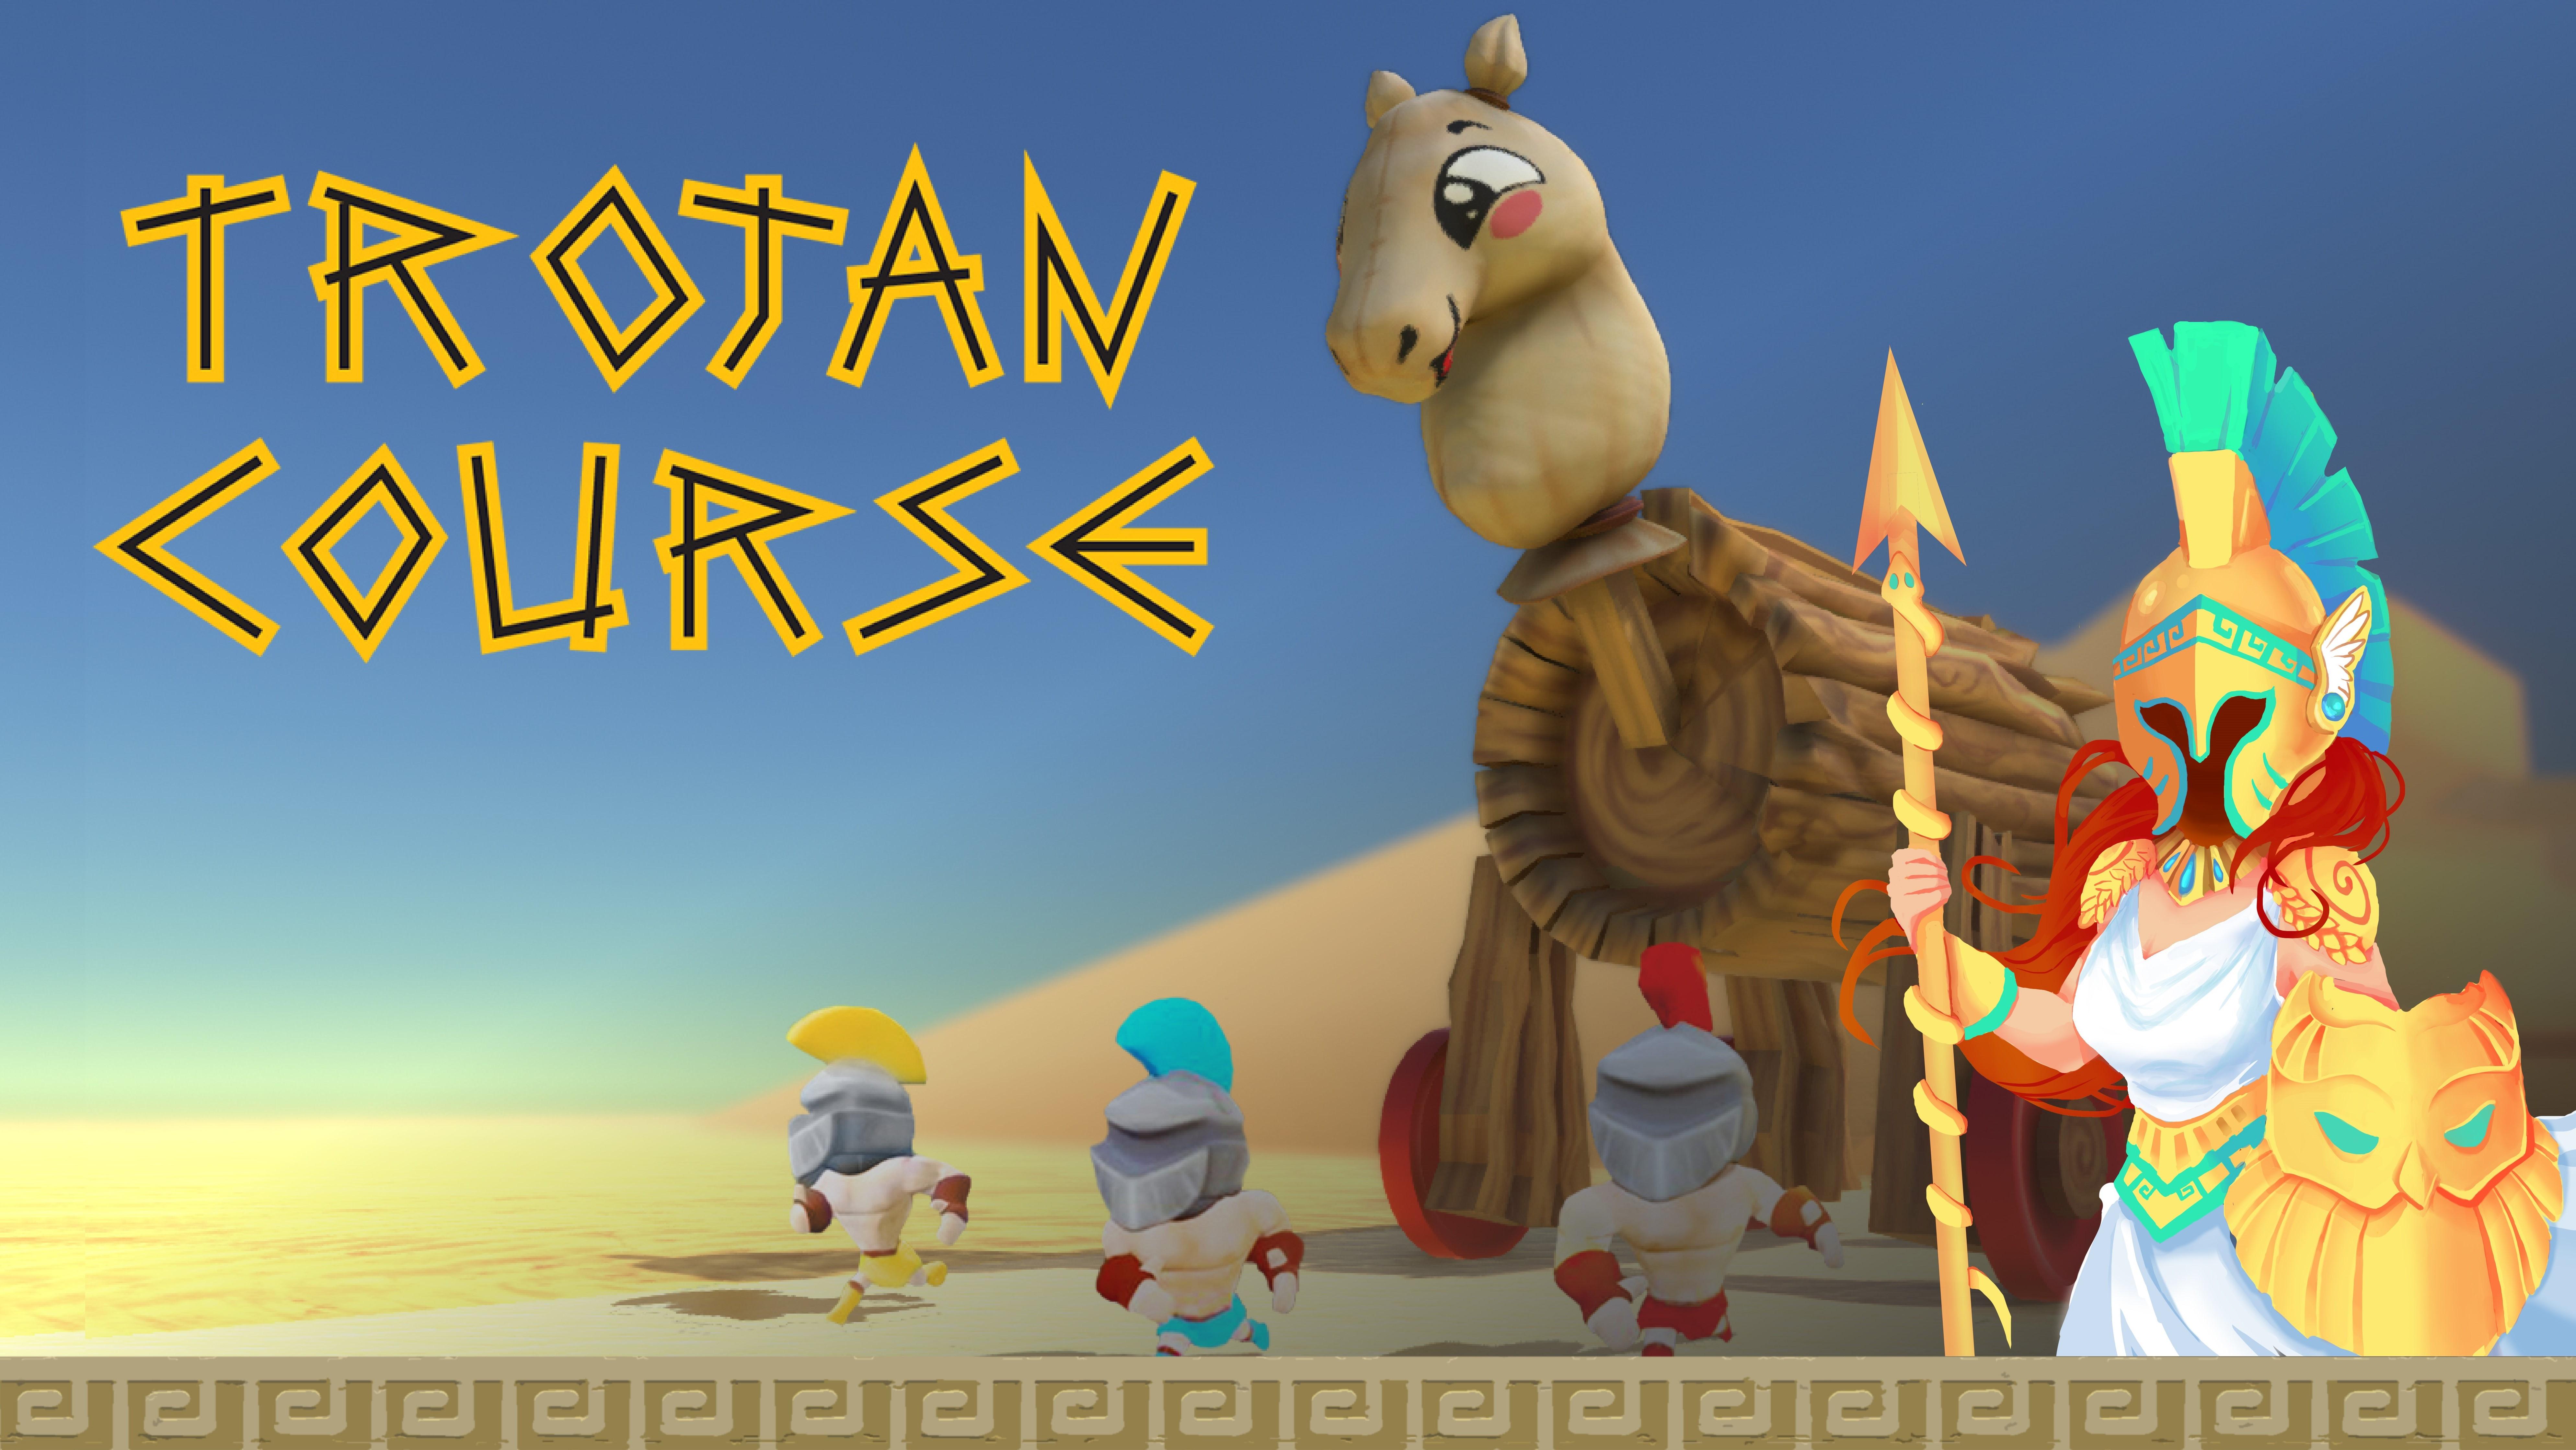 Trojan Course